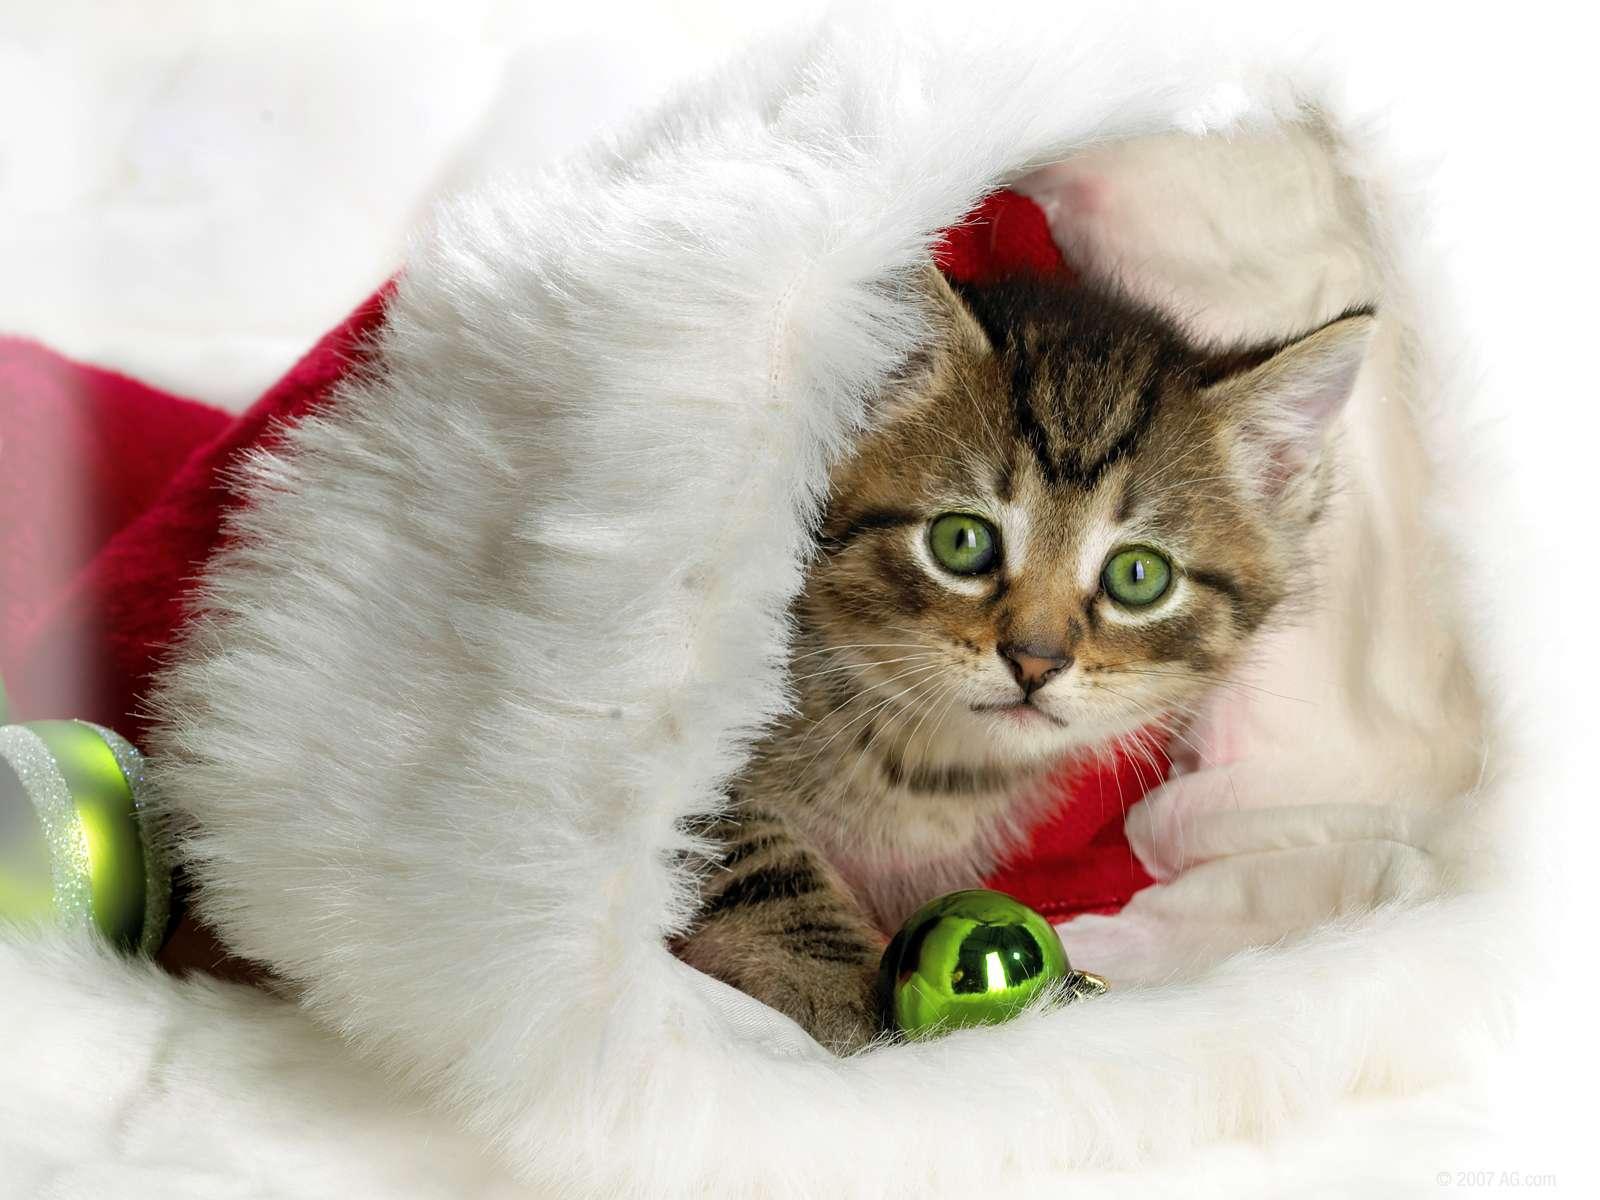 http://2.bp.blogspot.com/_Qr6jVOM_76s/TPPwFH2BVUI/AAAAAAAAAkc/A7MmHXvnVmA/s1600/gattino+nella+calza+natalizia.jpg